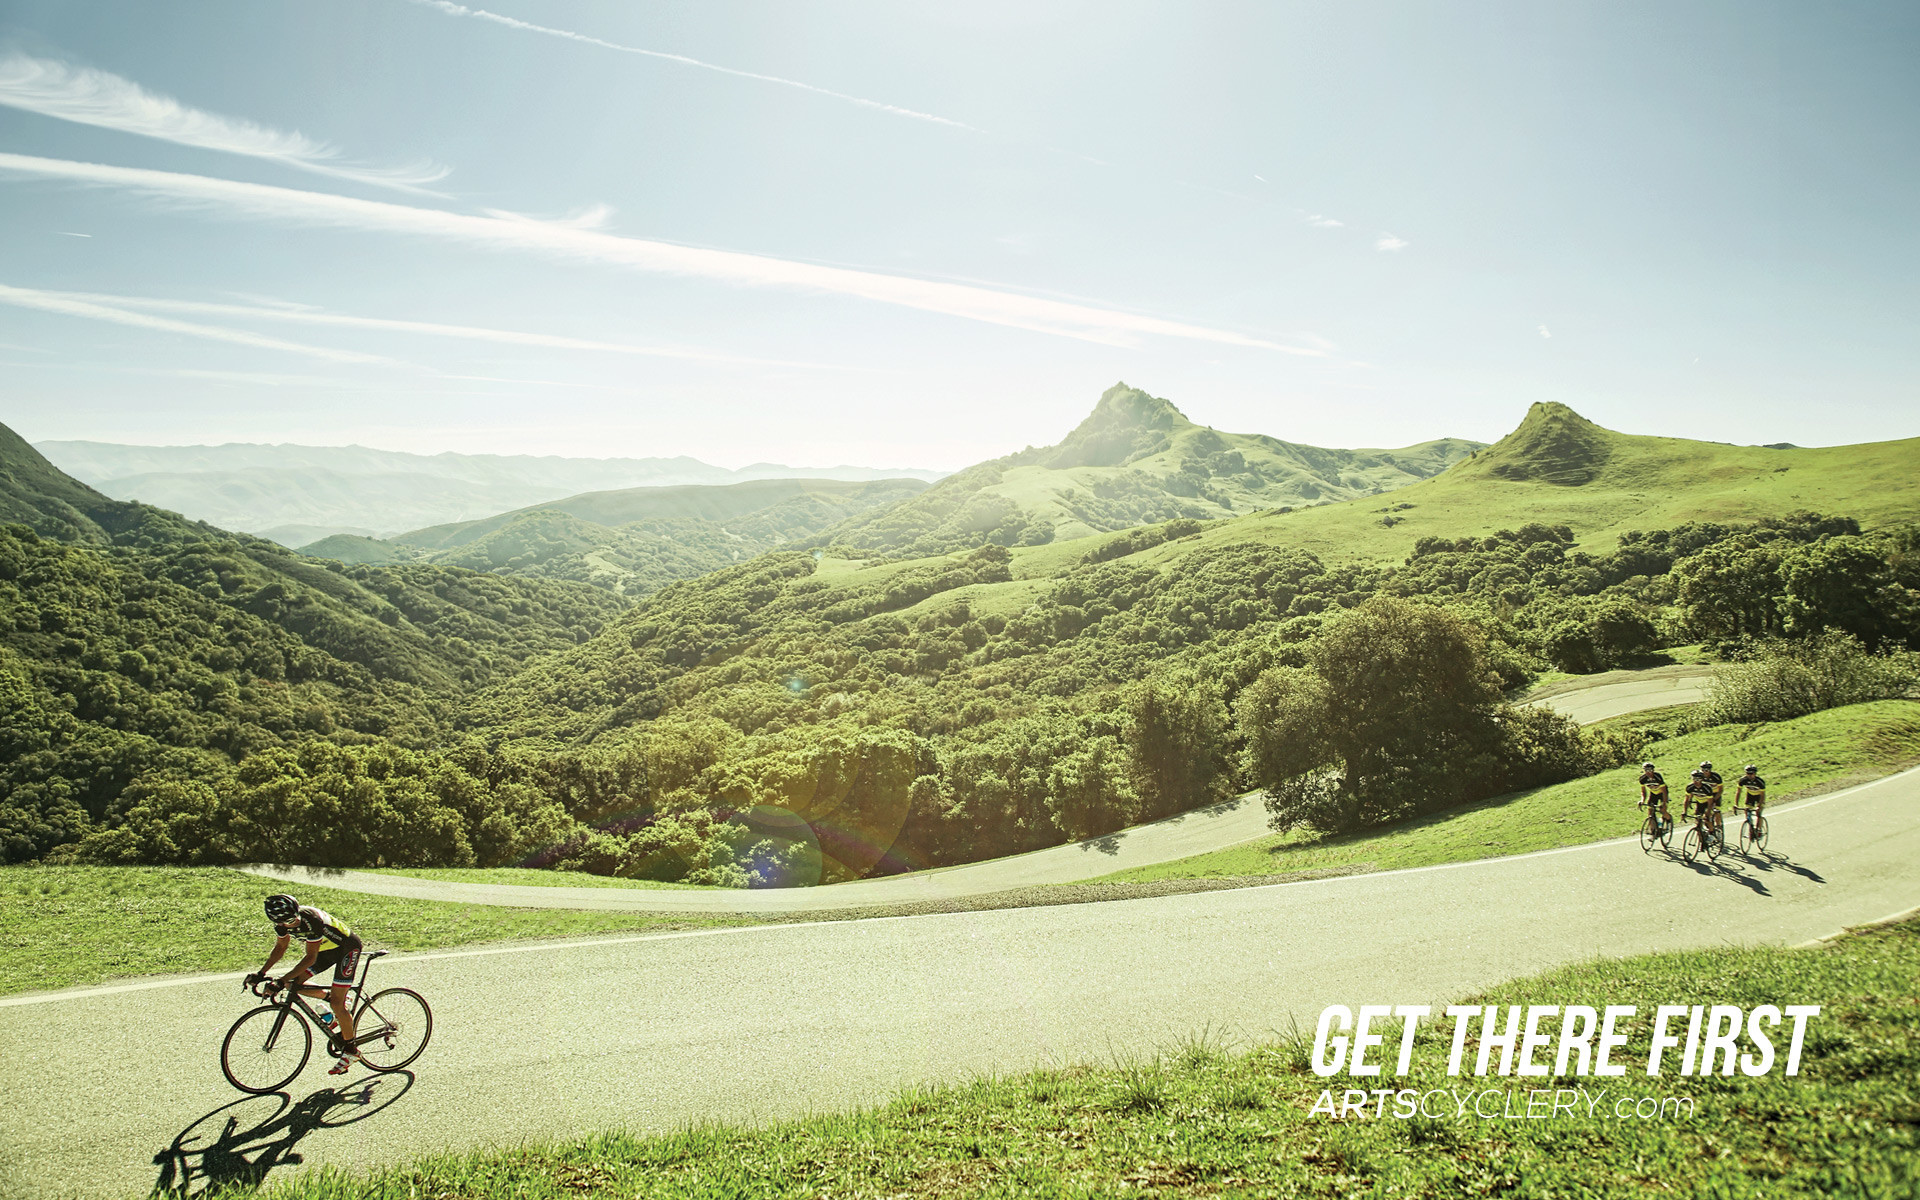 Road Cycling Wallpaper 62336 | UPSTORE